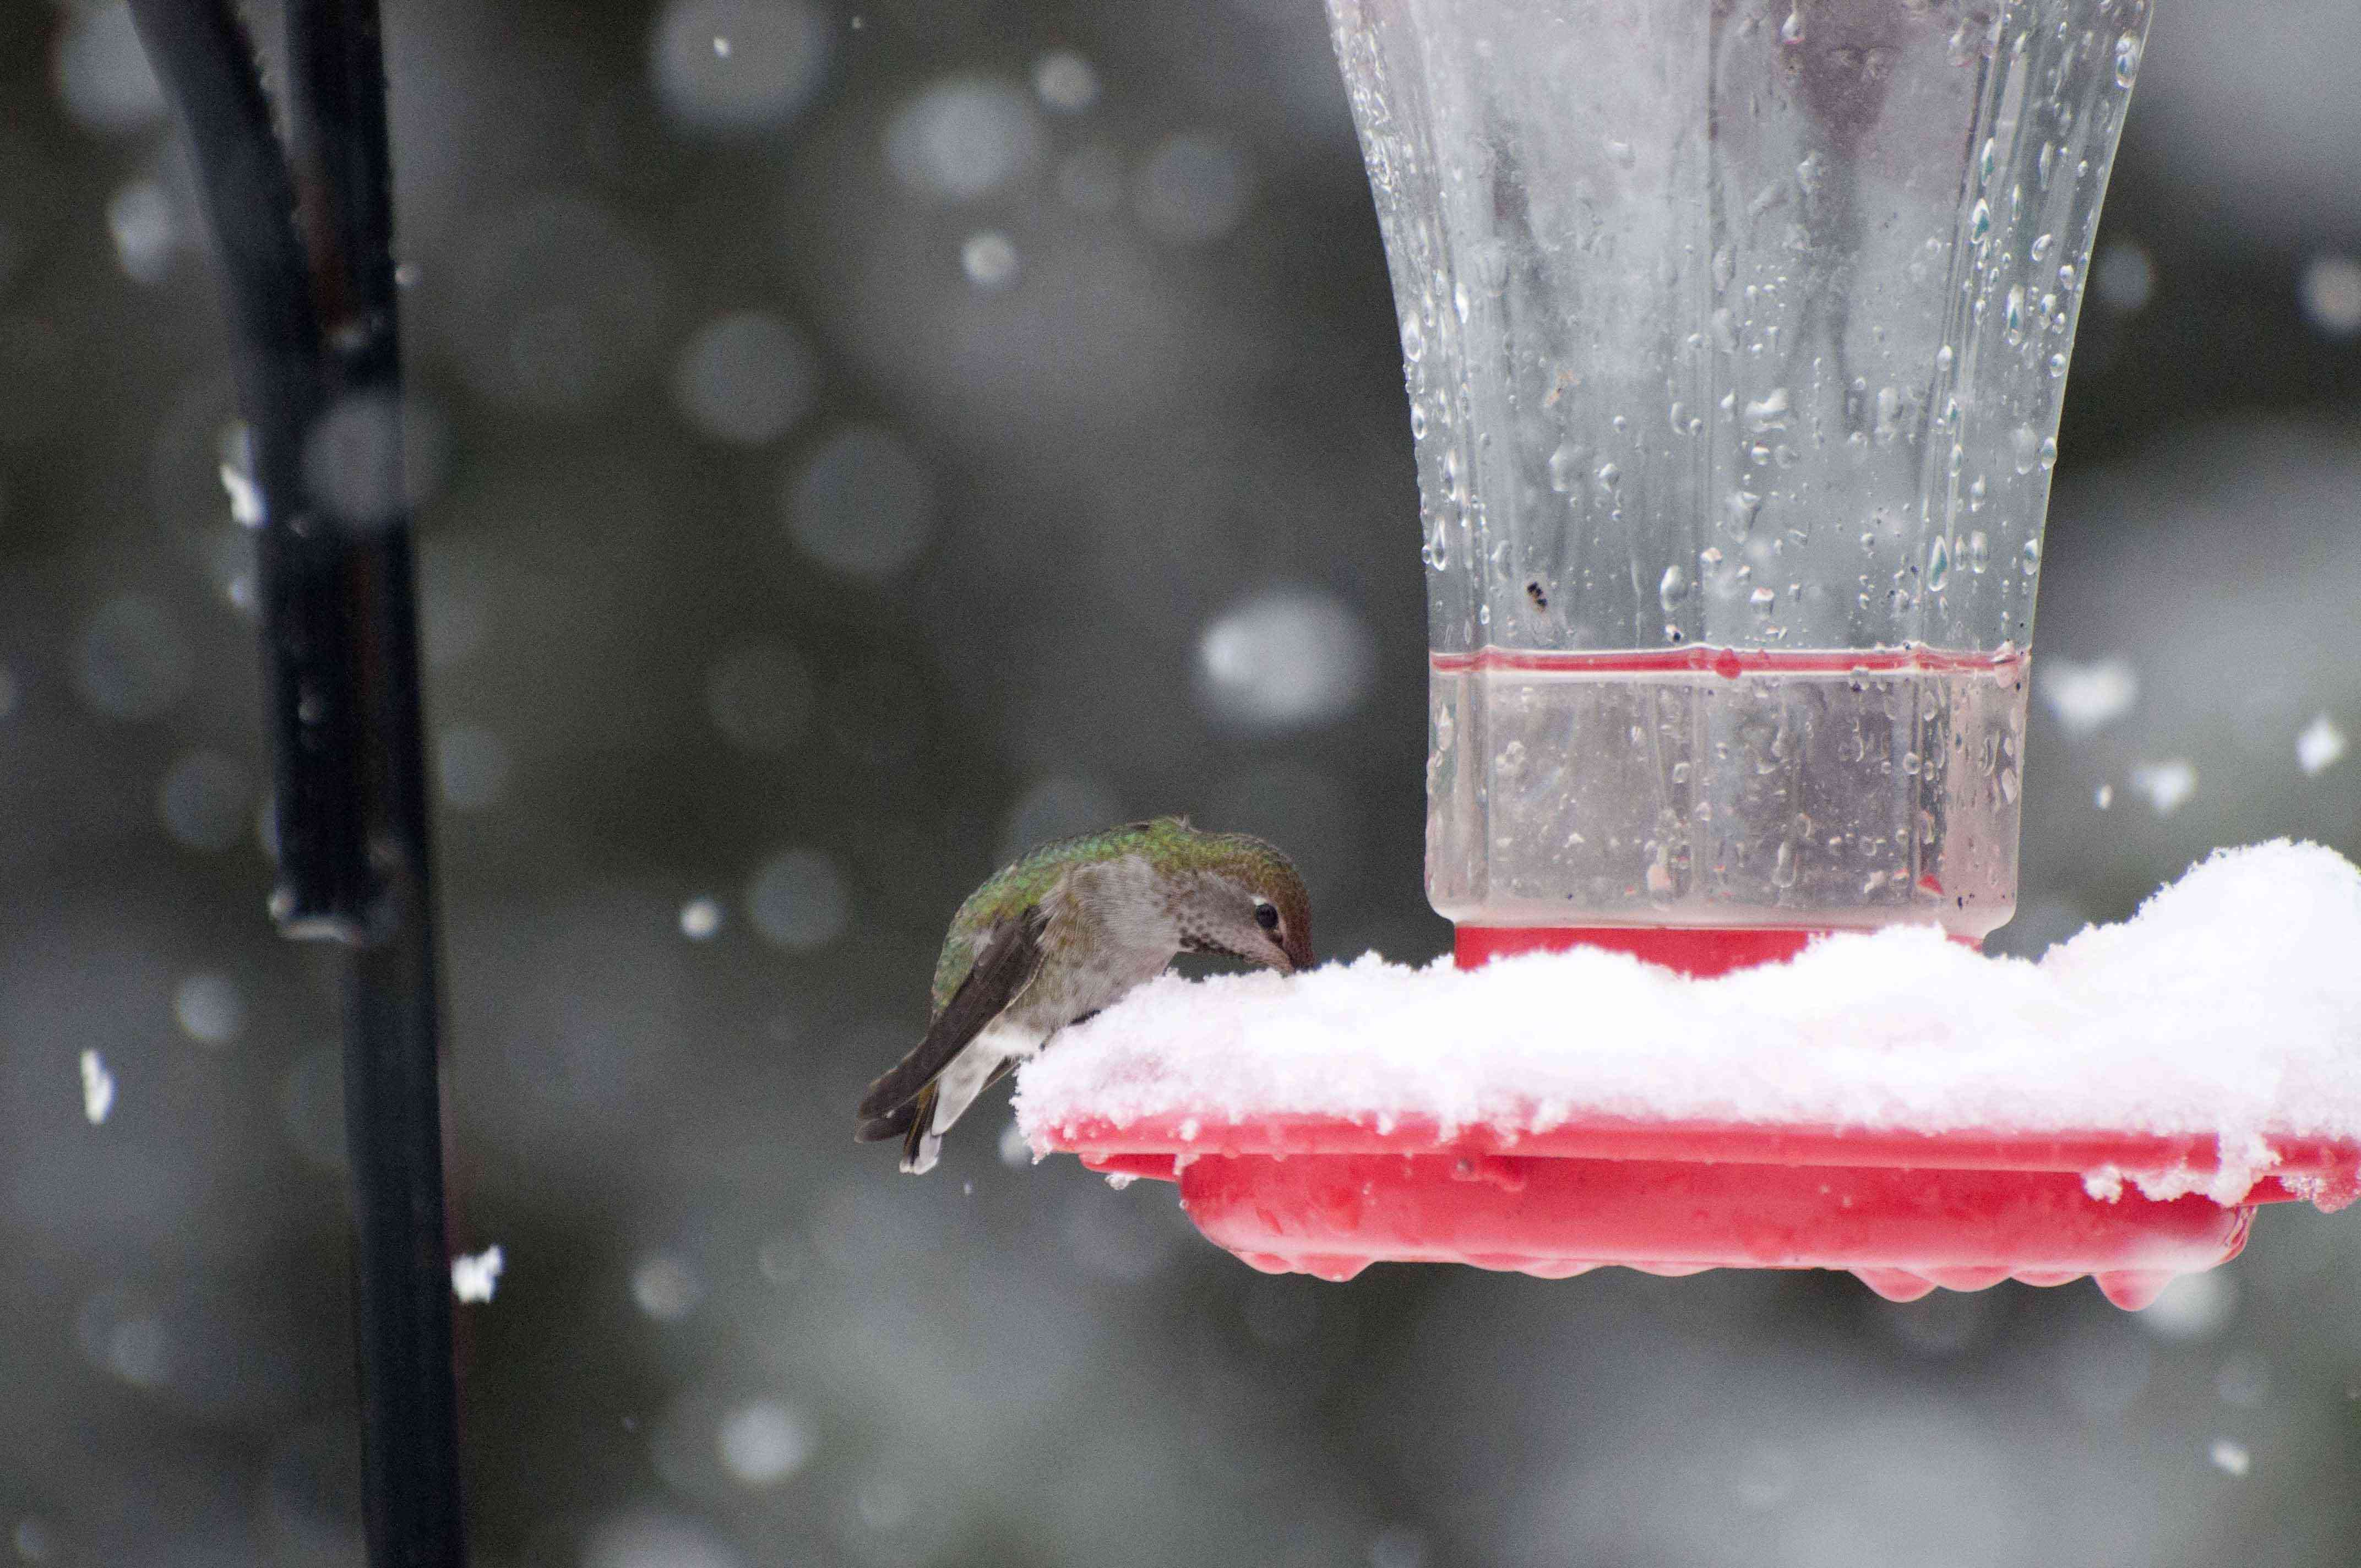 hummingbird at a hummingbird feeder in the snow